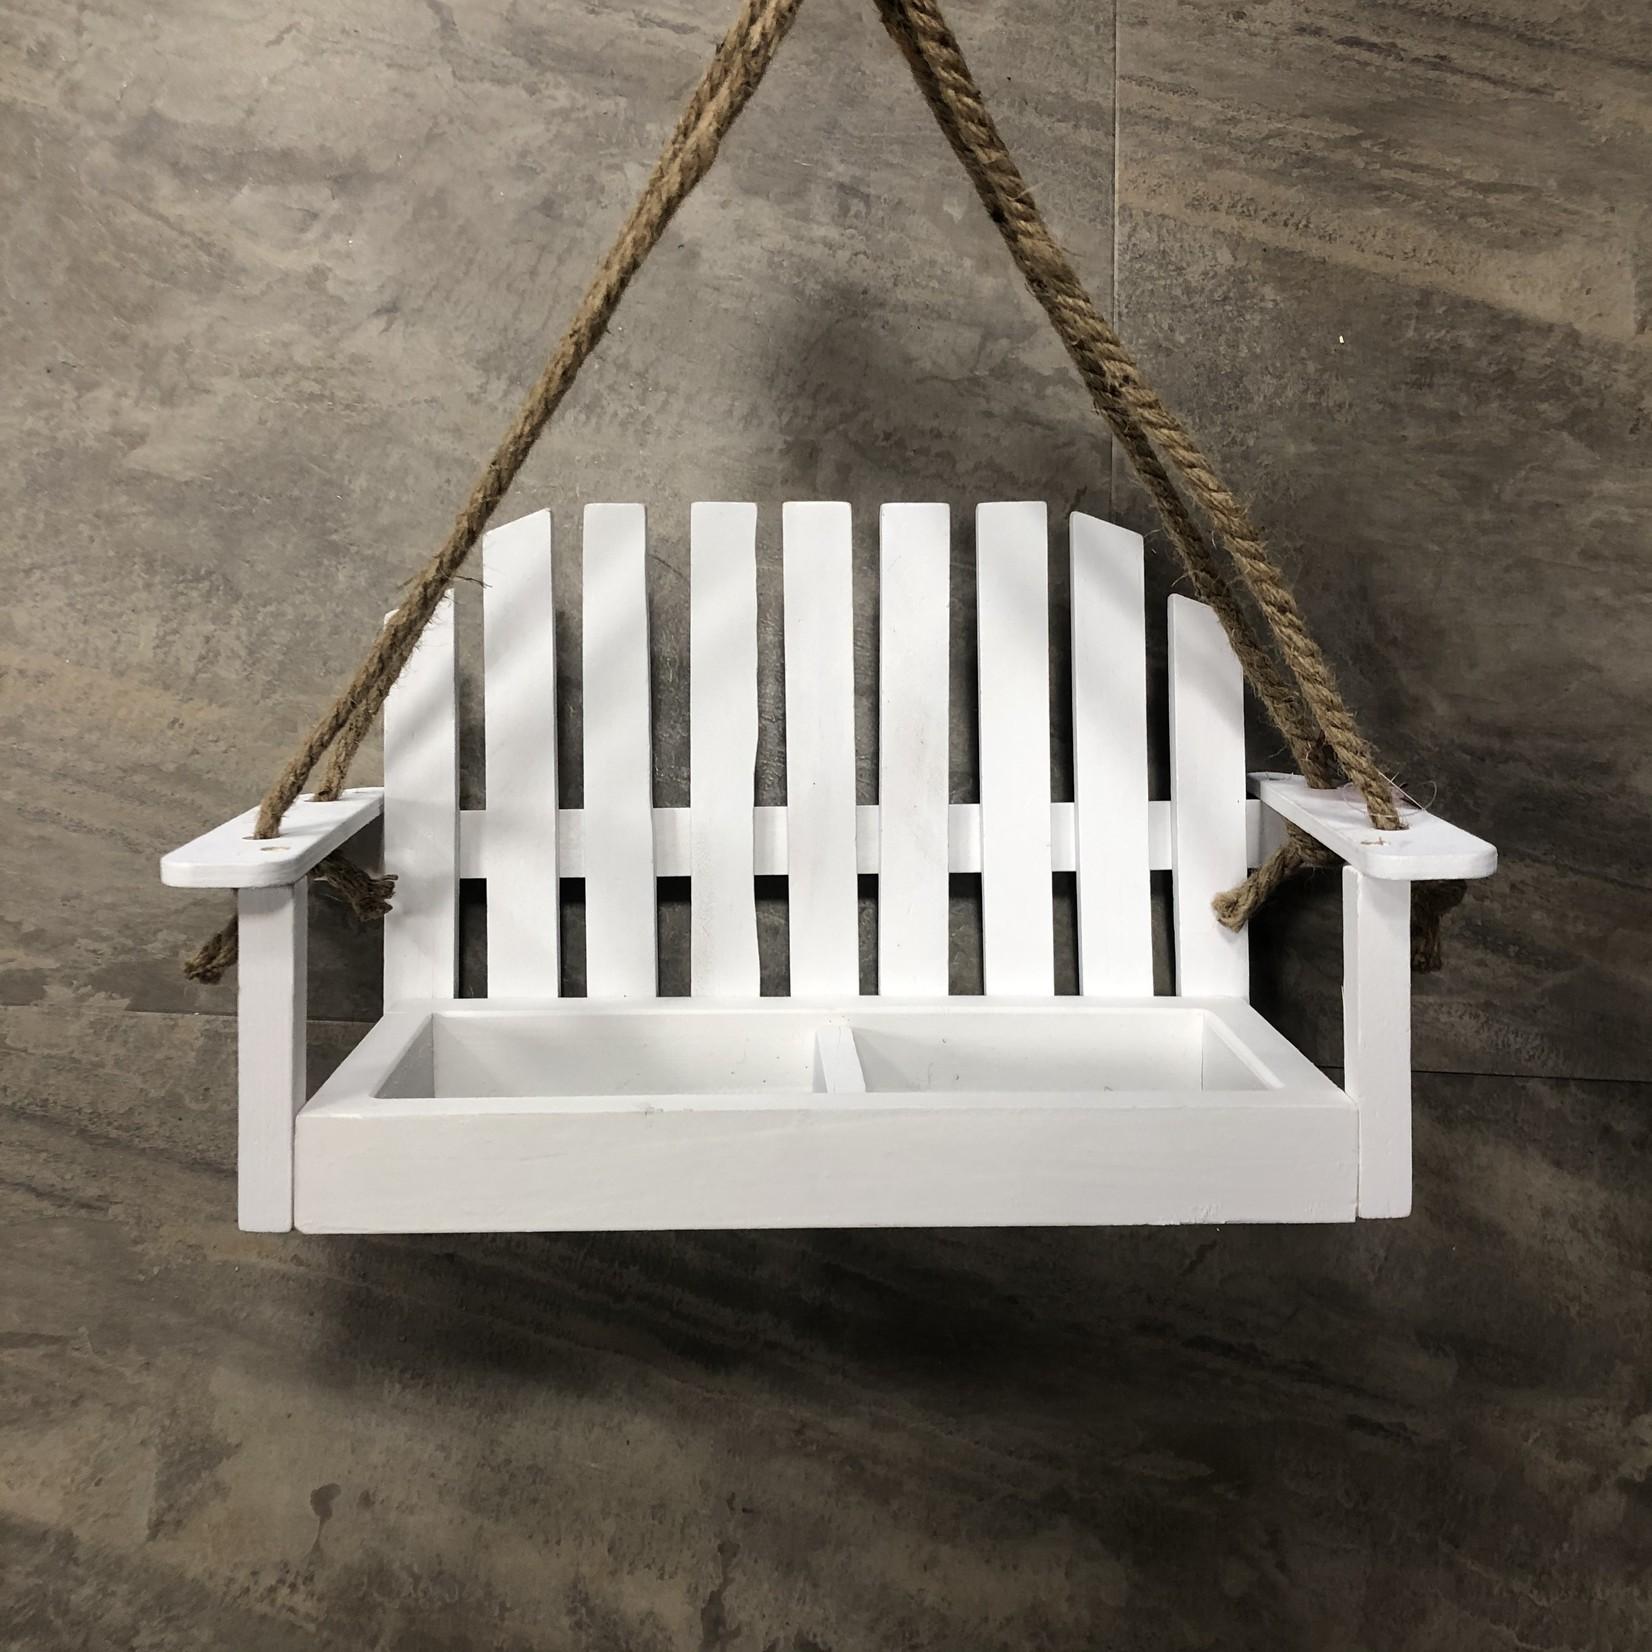 Swing Platform Tray Feeder